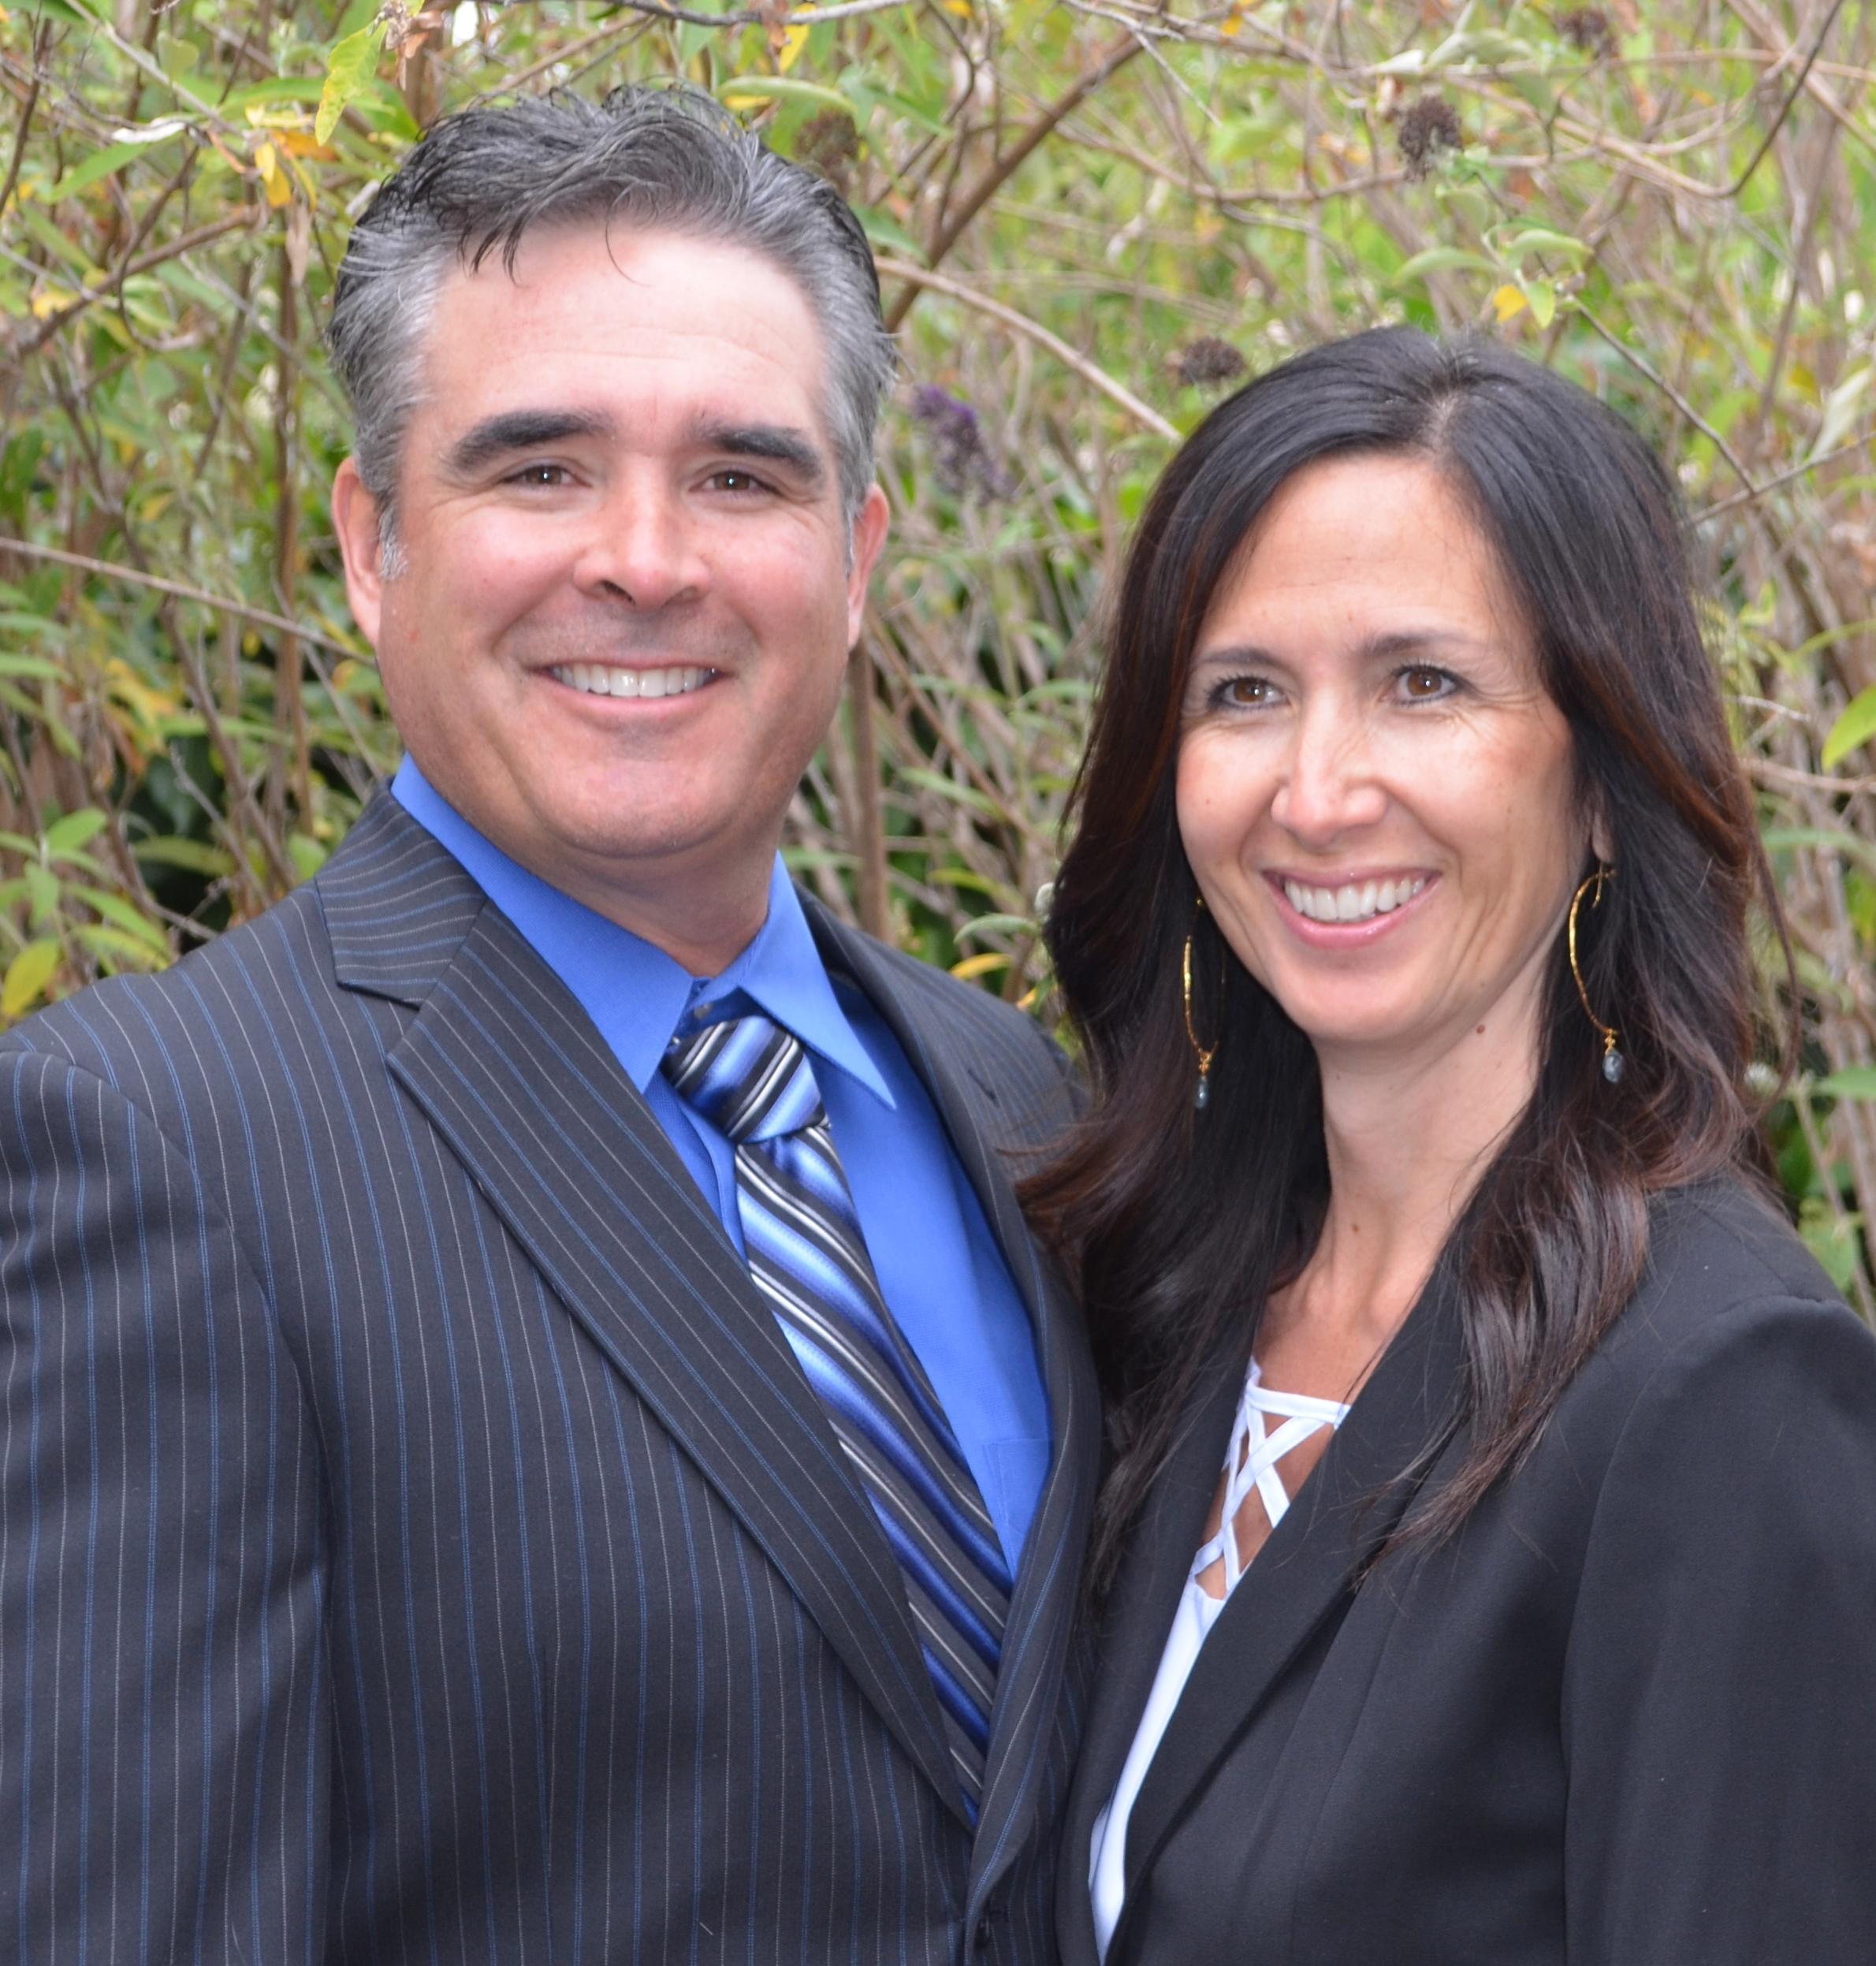 Roberta & Chris Hall, Owners